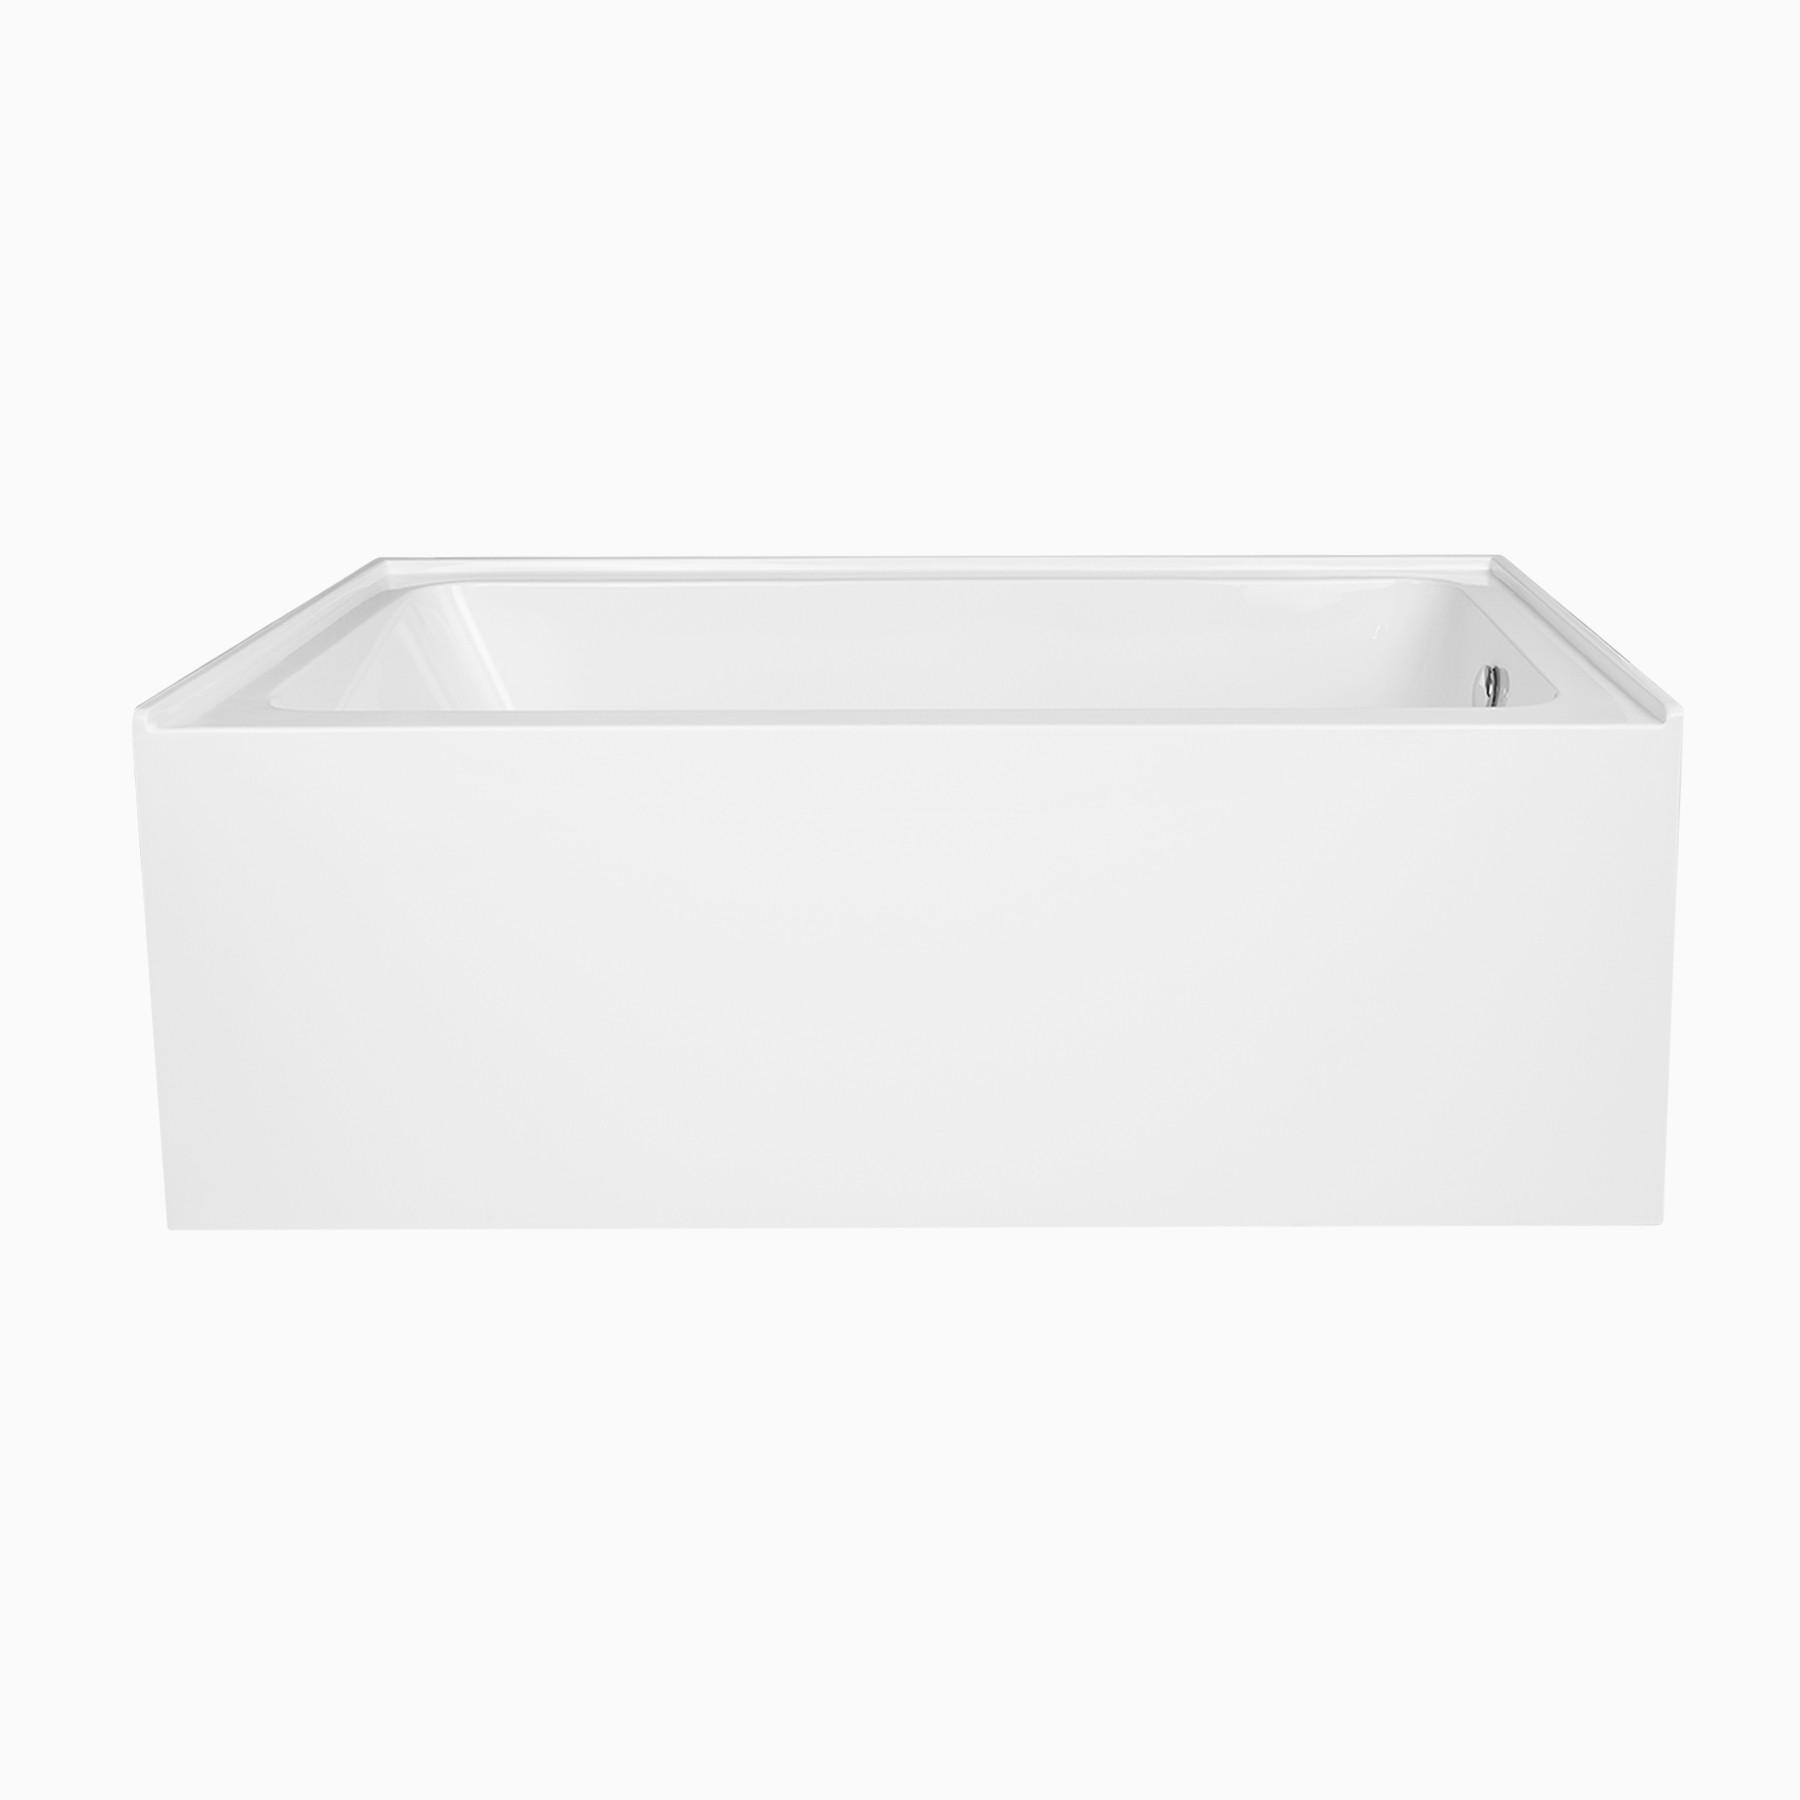 60 Pensacola Acrylic Alcove Bathtub Modern Rectangle Tub